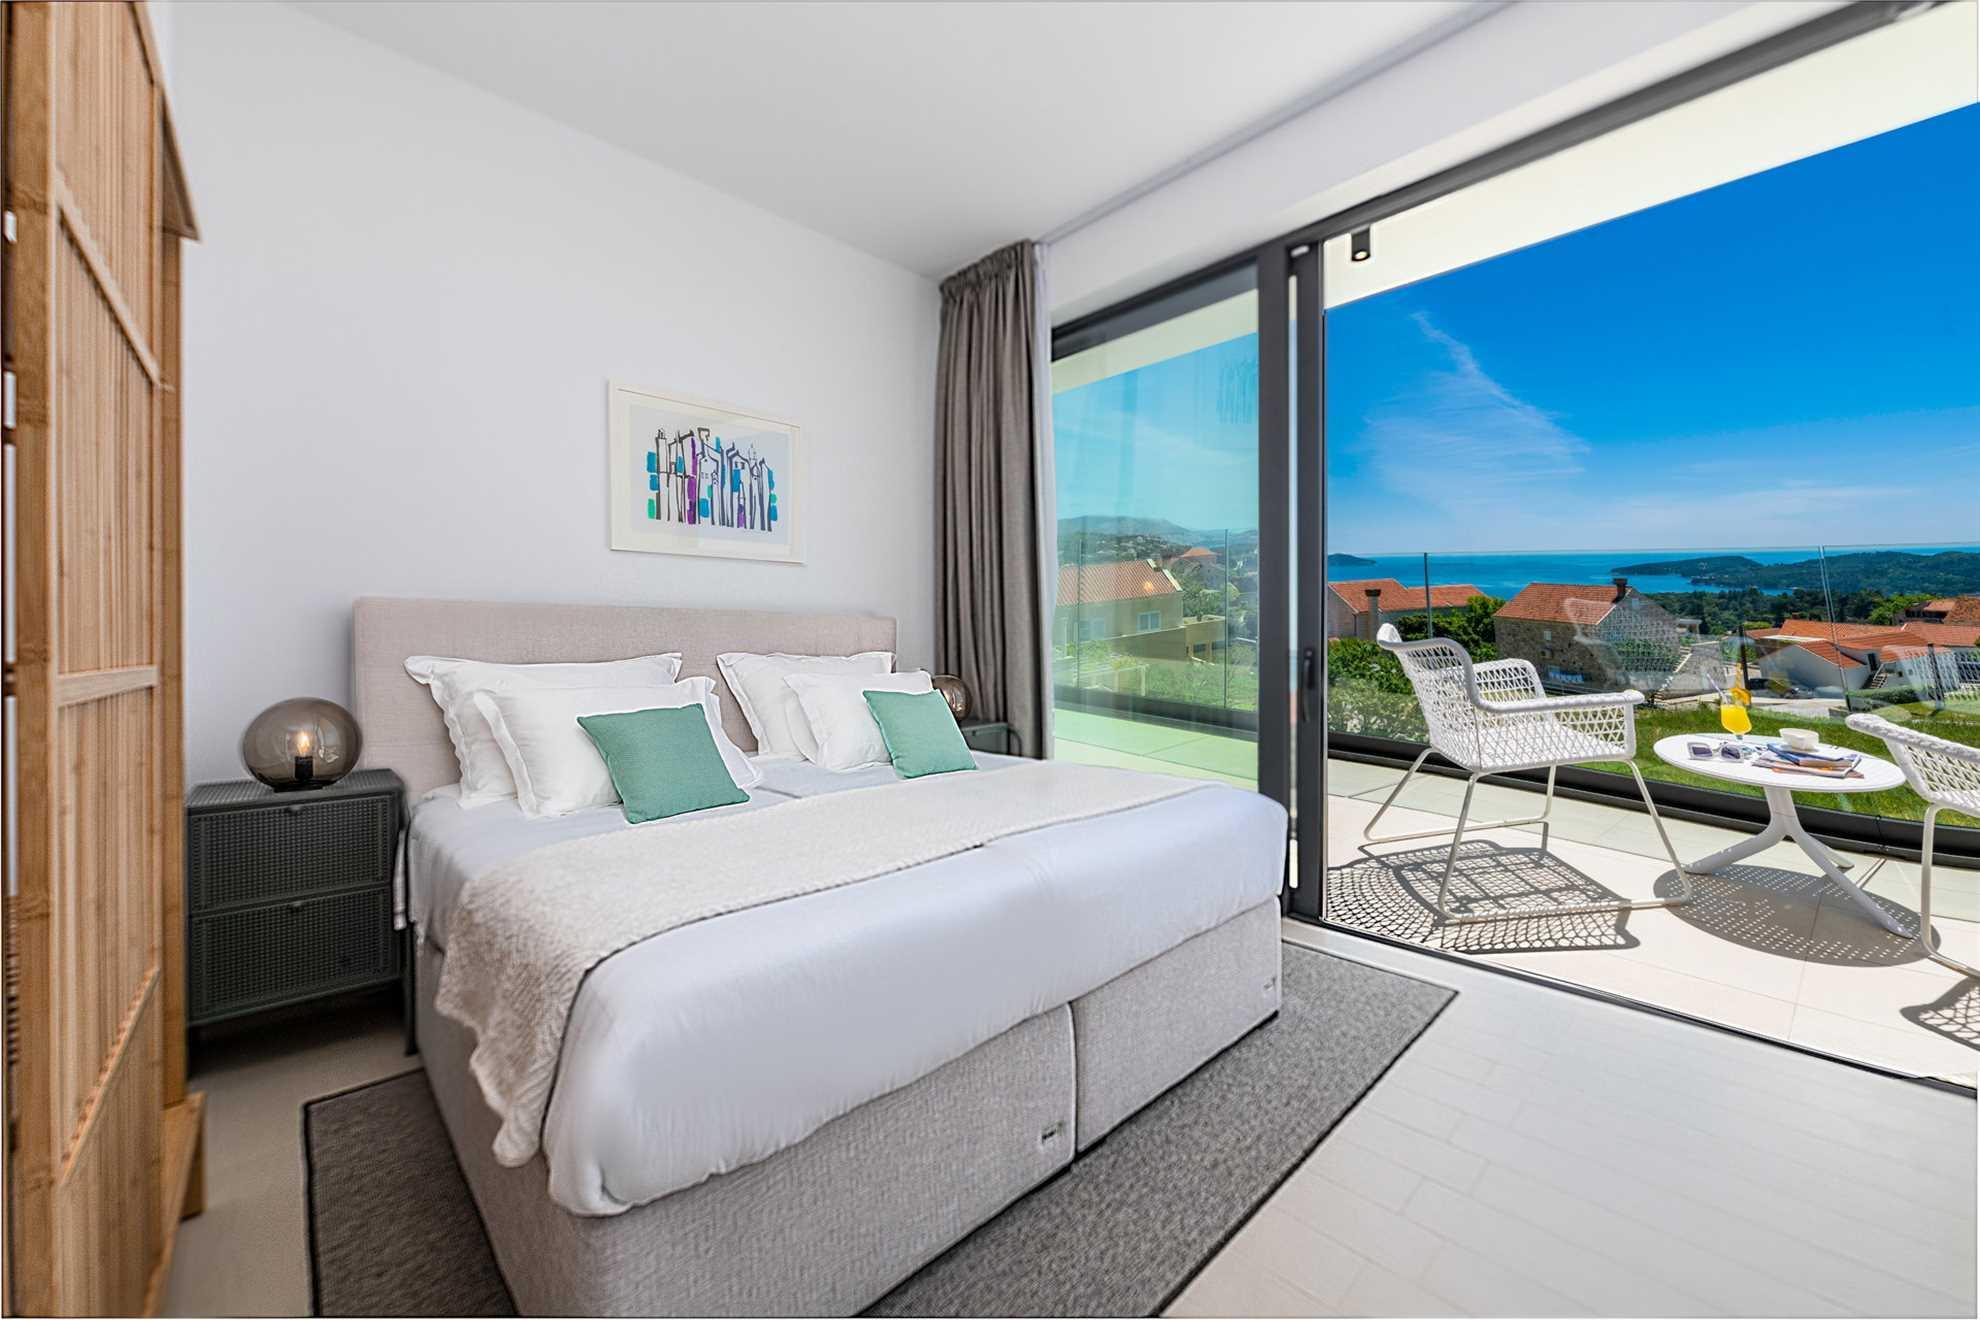 Villa Inner Peace Dubrovnik Bedroom View